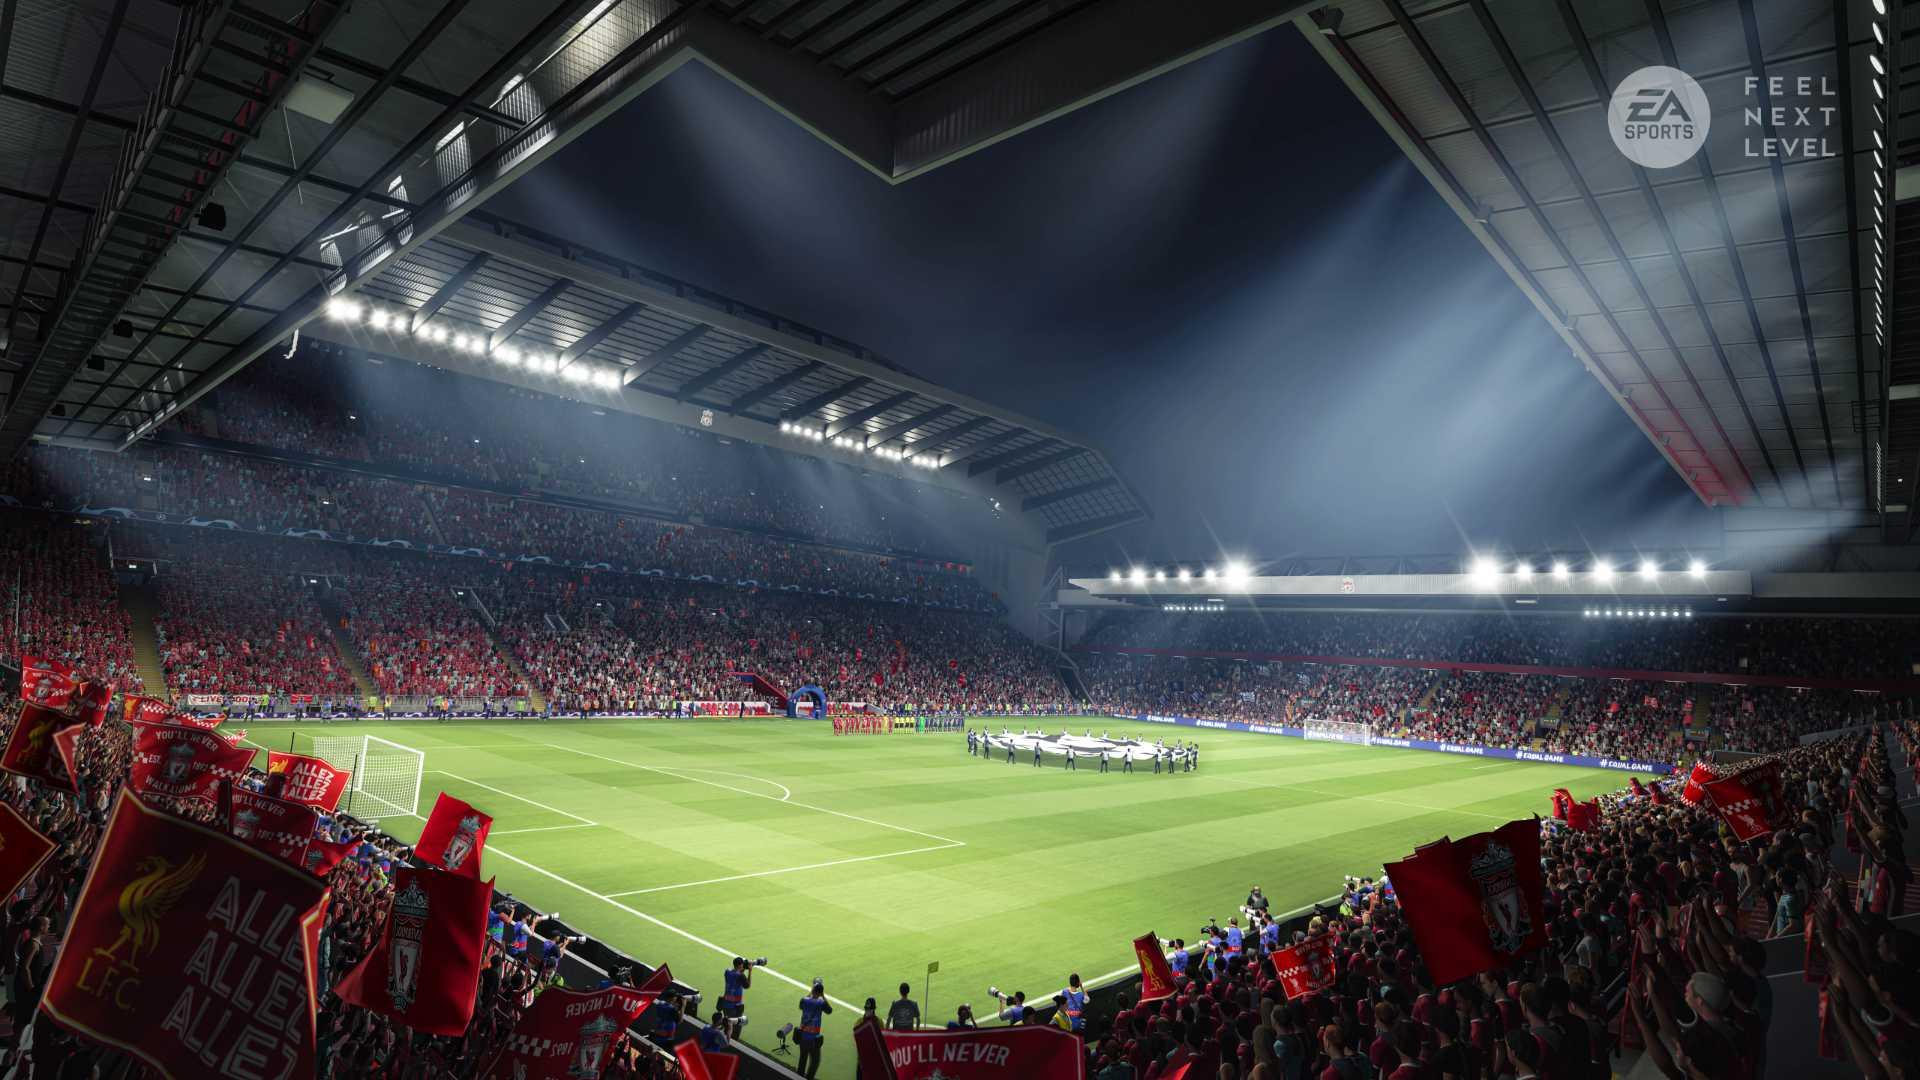 FIFA 21 - Next Level Screenshot